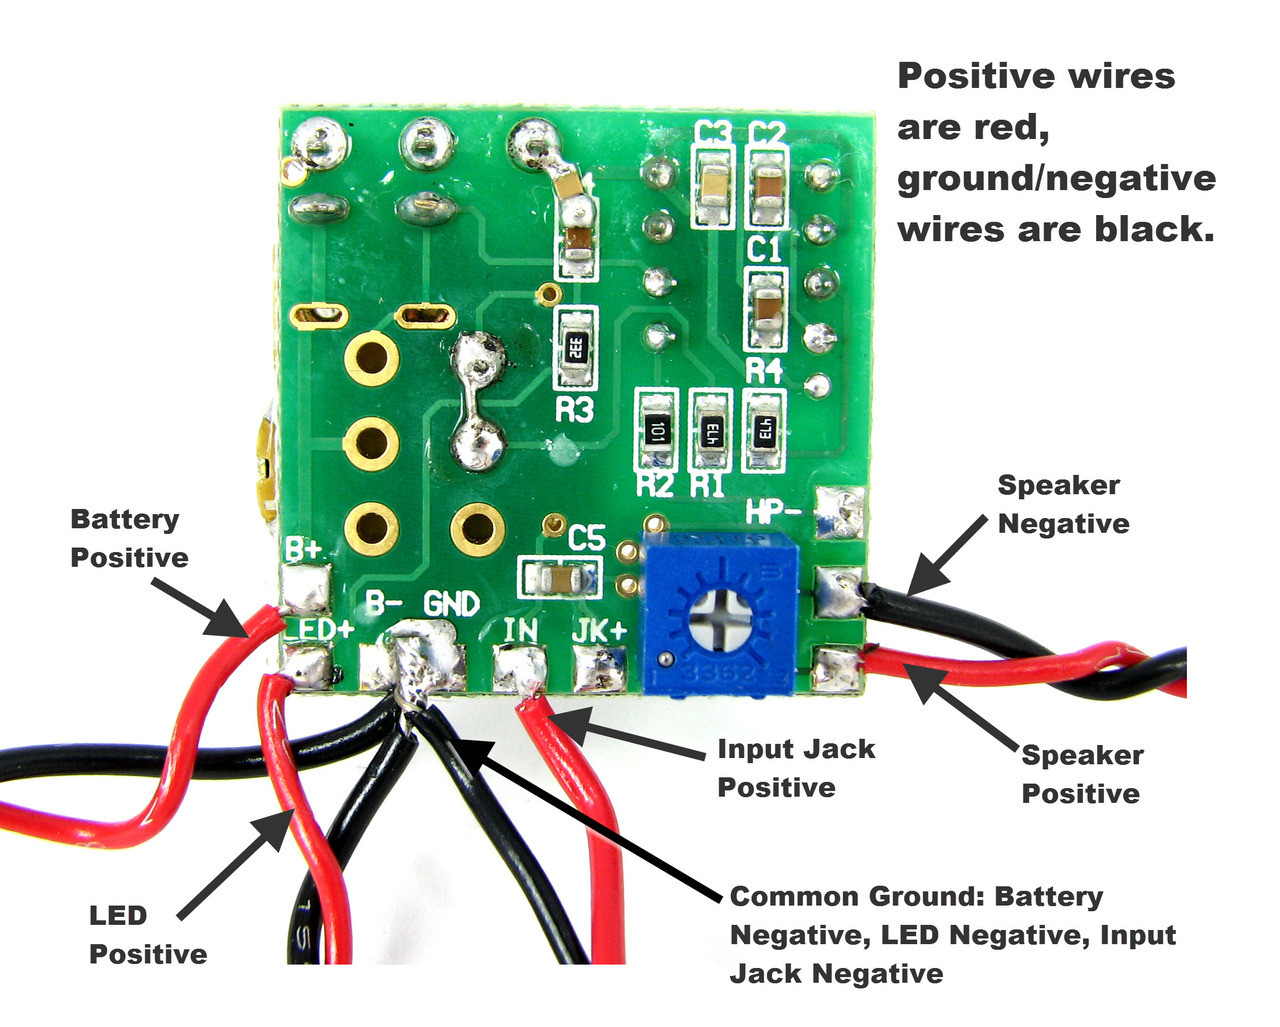 medium resolution of 1 4 jack wiring to circuit board wiring diagrams wd 1 4 plug wiring 1 4 inch audio jack wiring